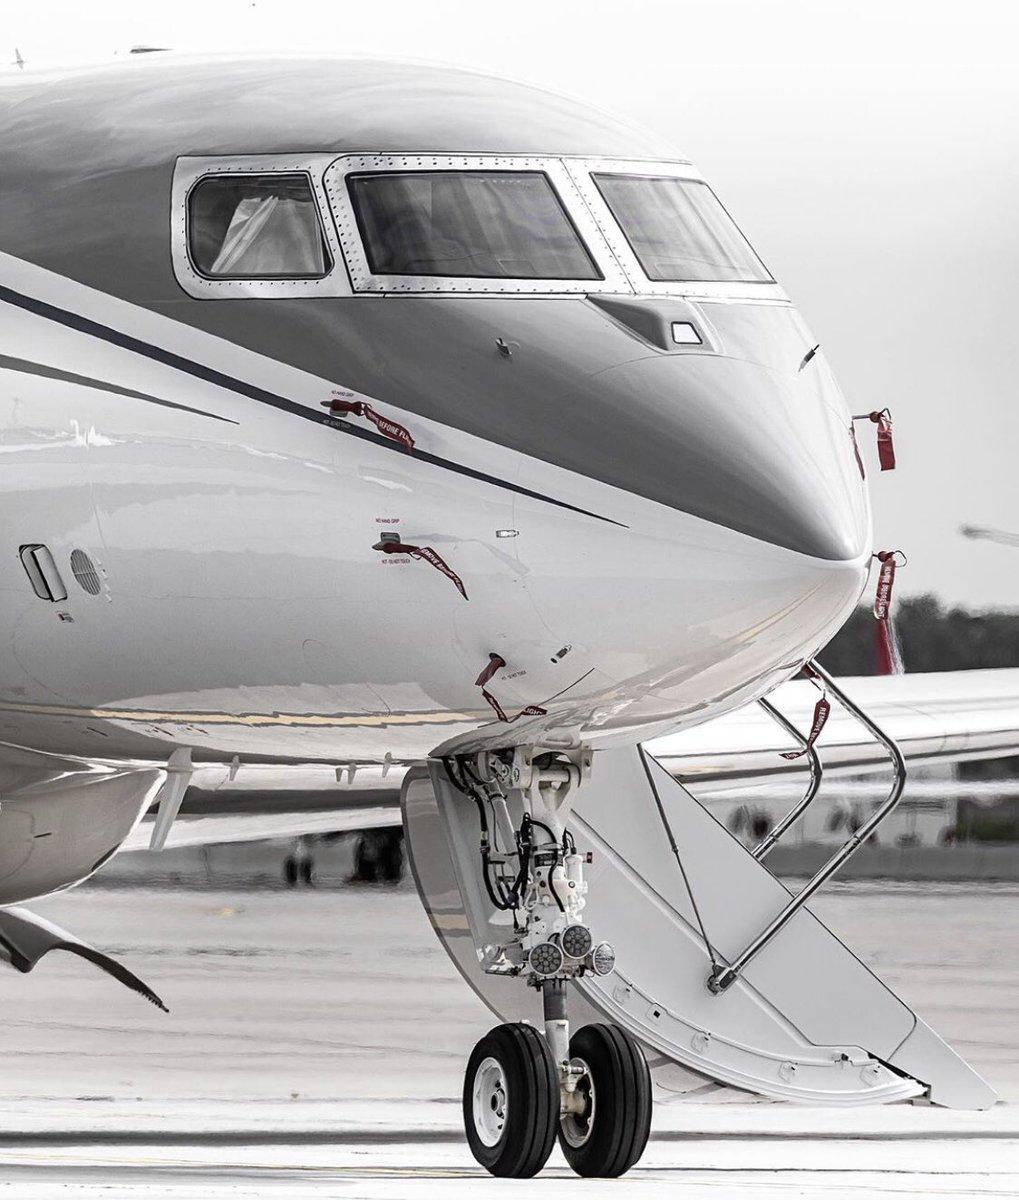 #BusinessJets @bigbird.aviation® iconic look of #Gulfstream #G650 . #instagramaviation #megaplane #BusinessAviation #FlyPrivate #PrivateJet  #CharterJet #BizJet #Flight #Luxury  #Travel #EmptyLeg #BusinessJet #CorporateJet #Aviation https://t.co/CrcOStJVye